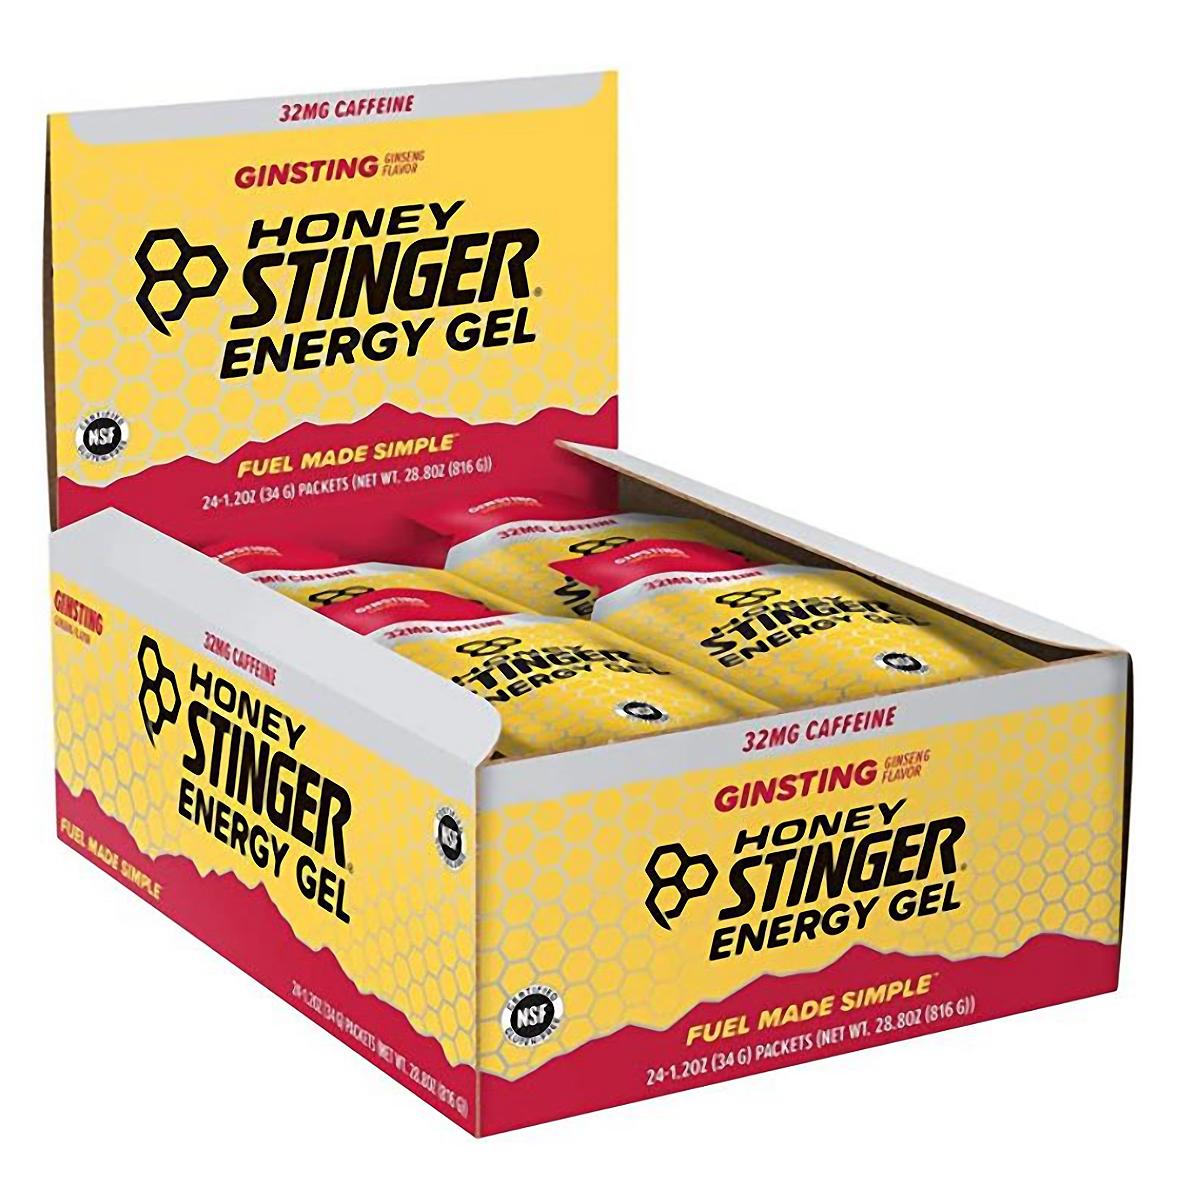 Honey Stinger Energy Gel - Flavor: Ginsting + Caffeine - Size: Box of 24, Caffeinated Ginsting, large, image 2